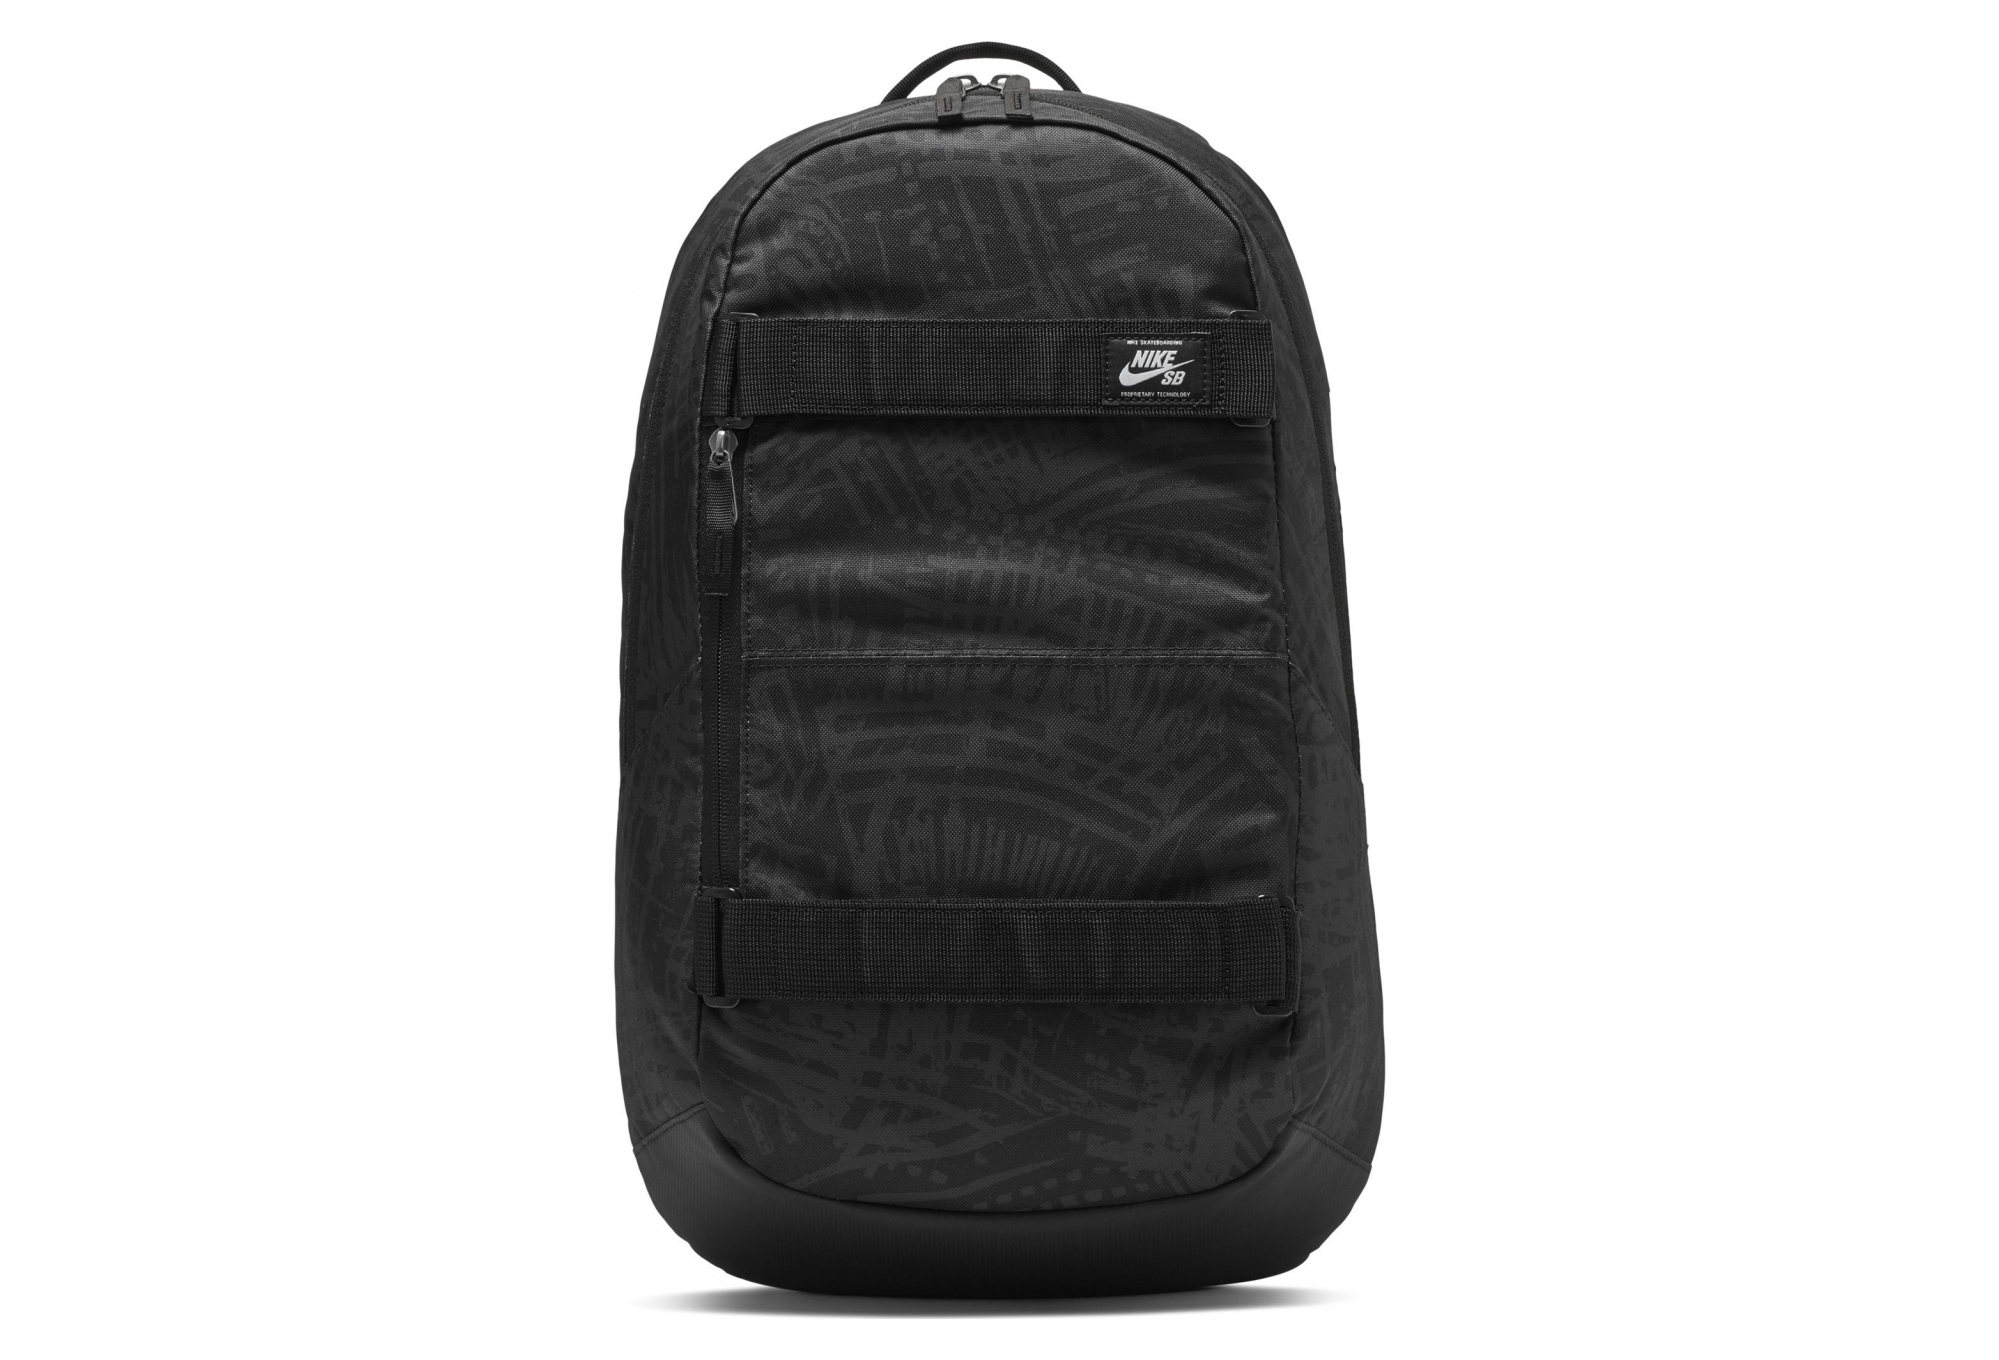 Nike SB Courthouse Backpack BLACK/BLACK/WHITE